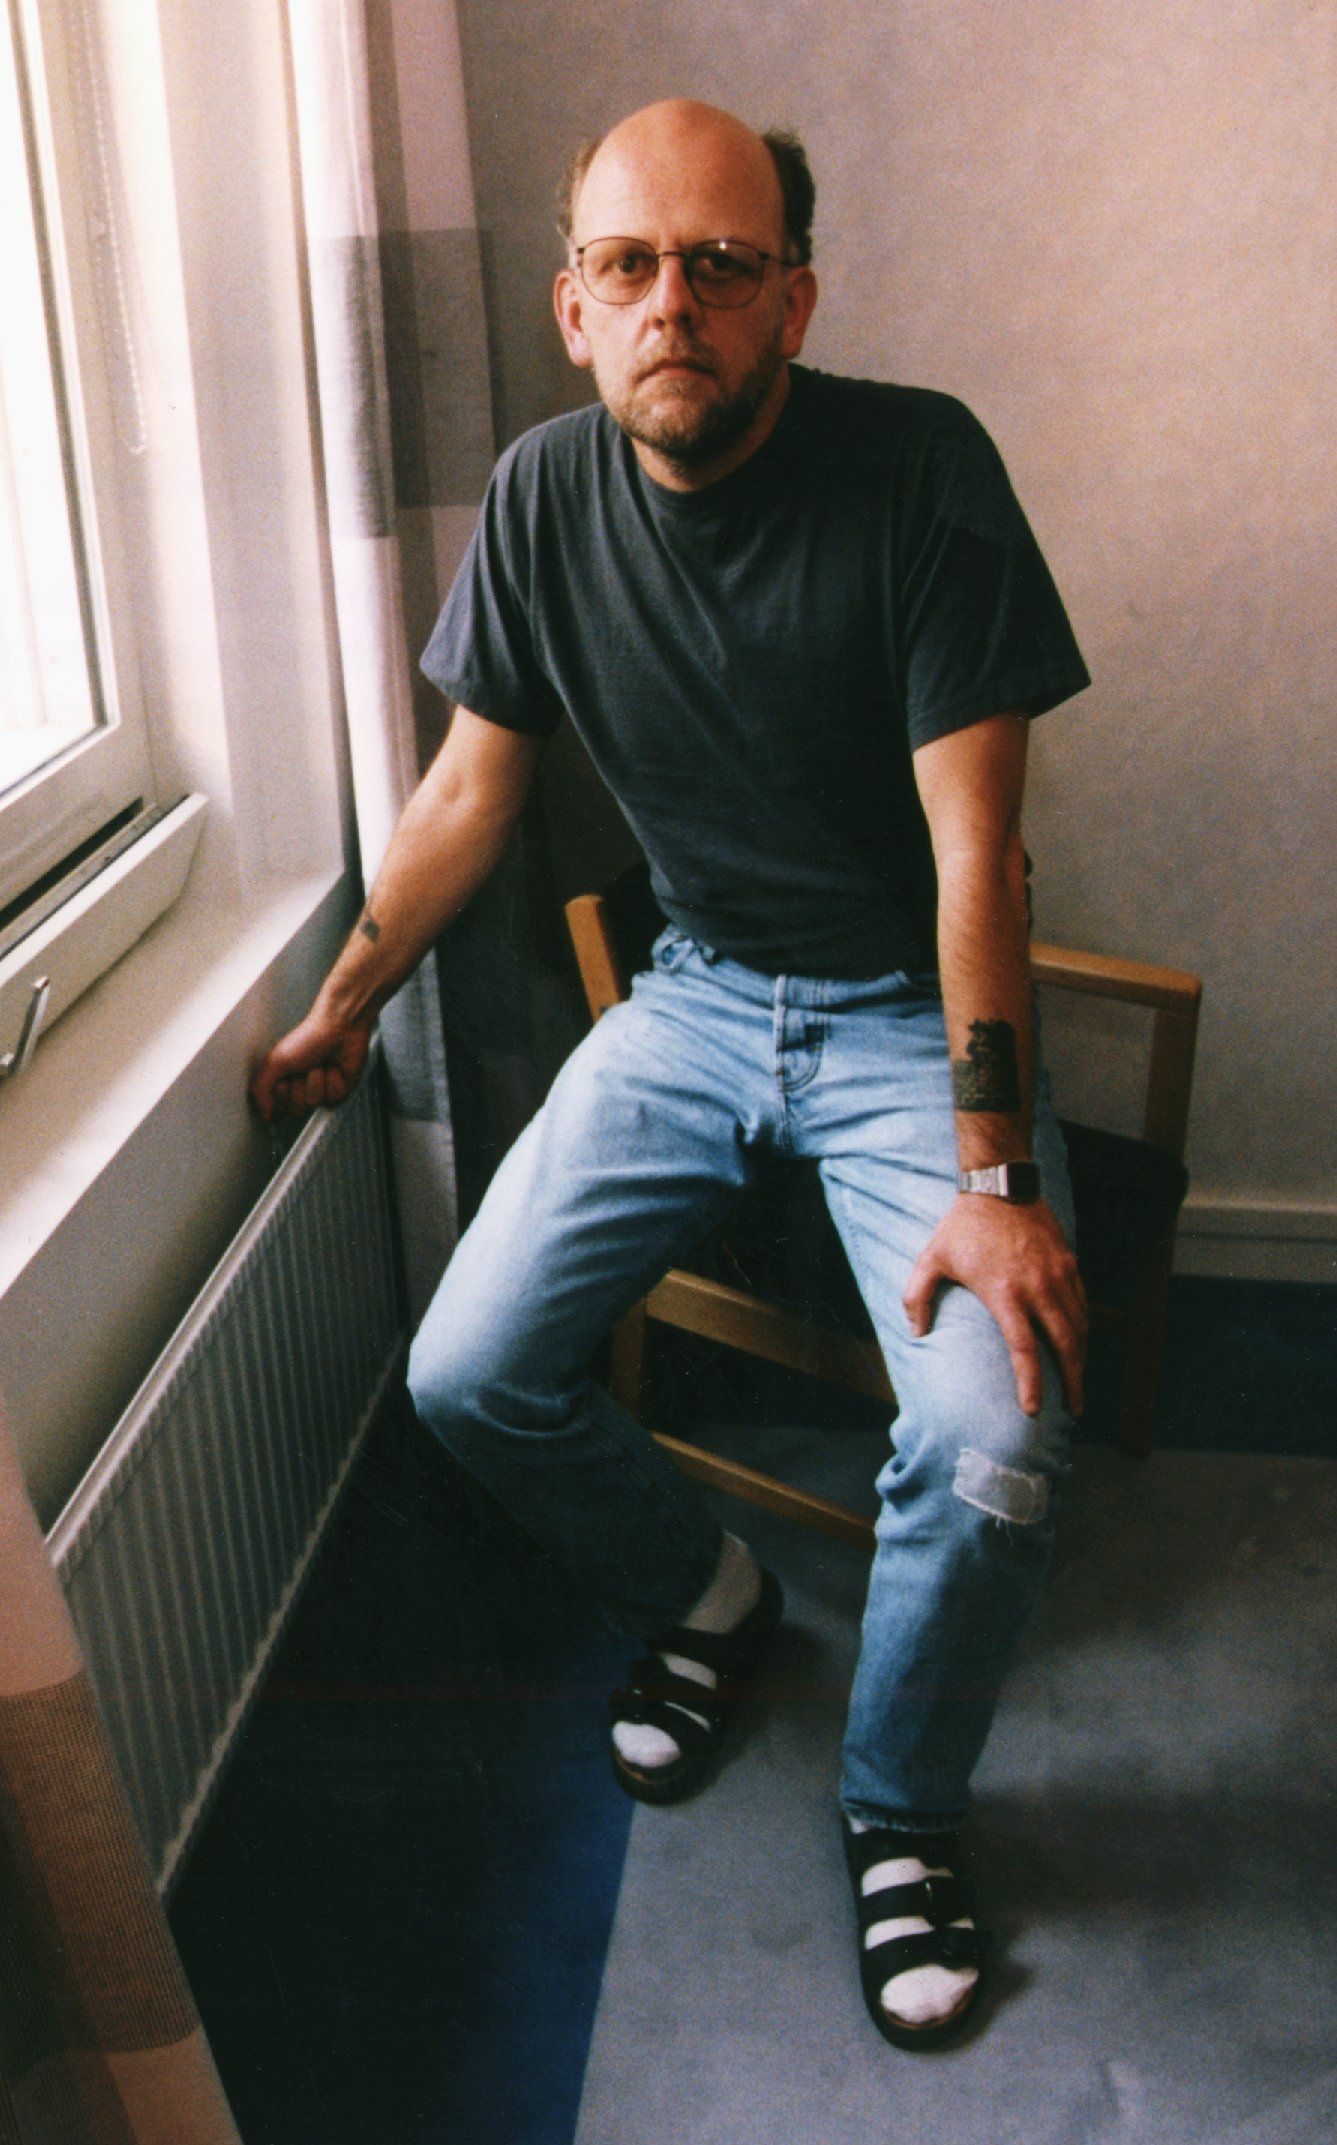 Thomas Quick/ Sture Bergwall